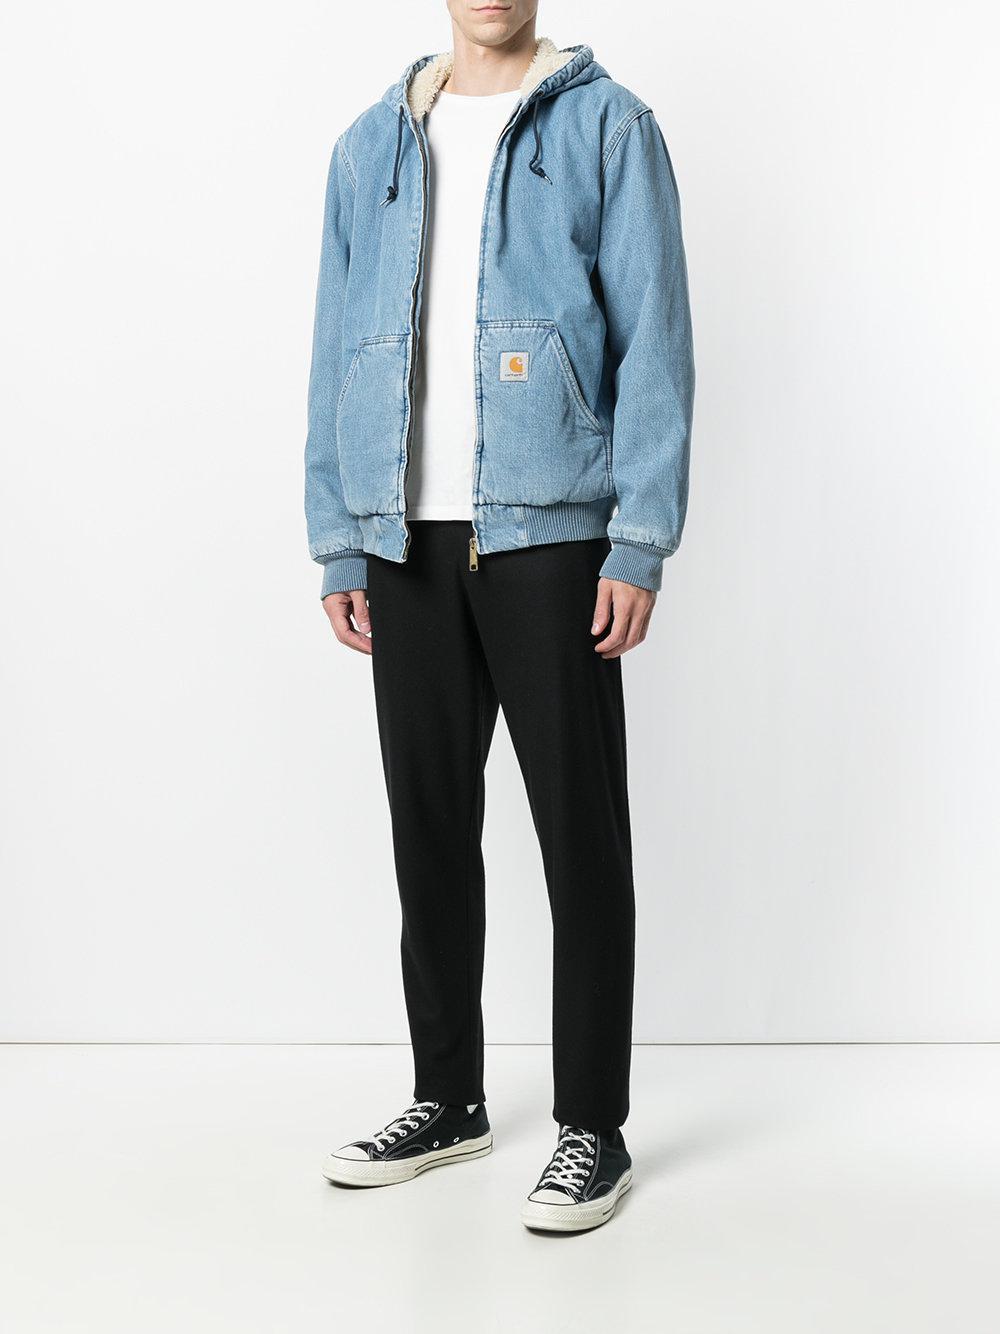 Carhartt Shearling Denim Jacket in Blue for Men